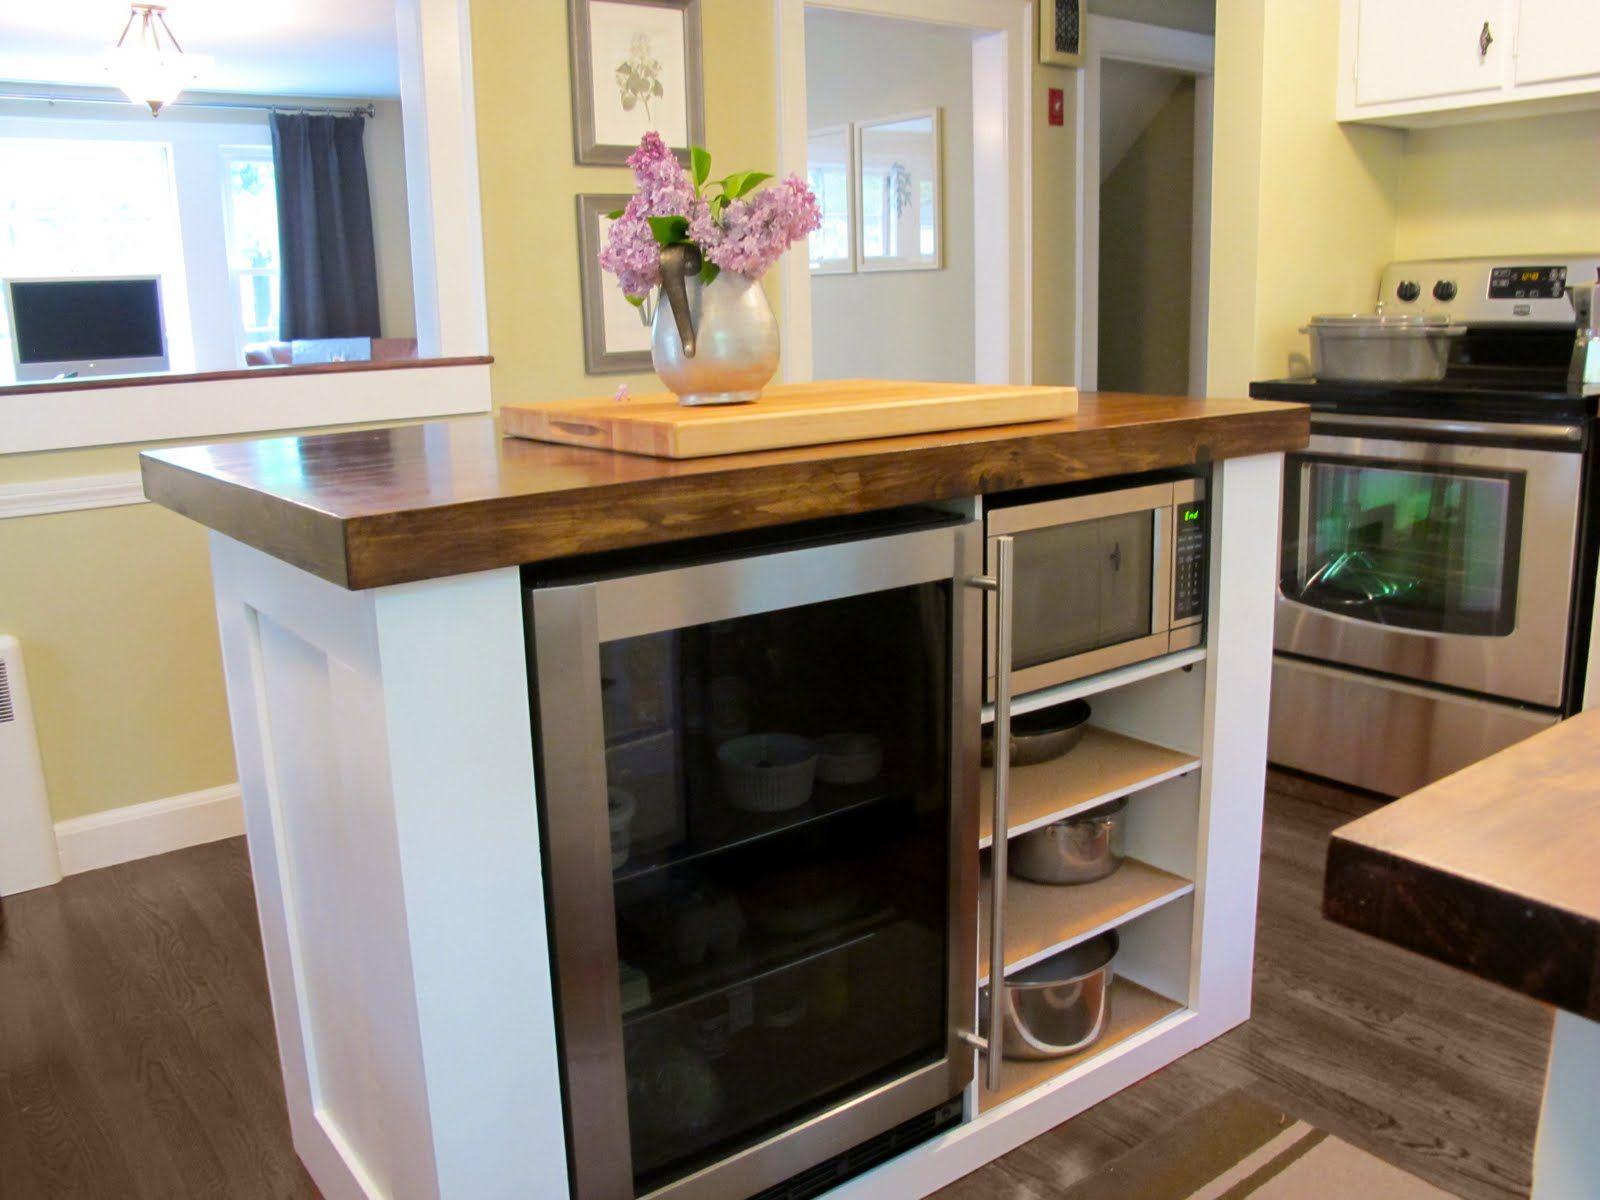 kitchen island diy kitchen island built refridgerator diy idea build ...